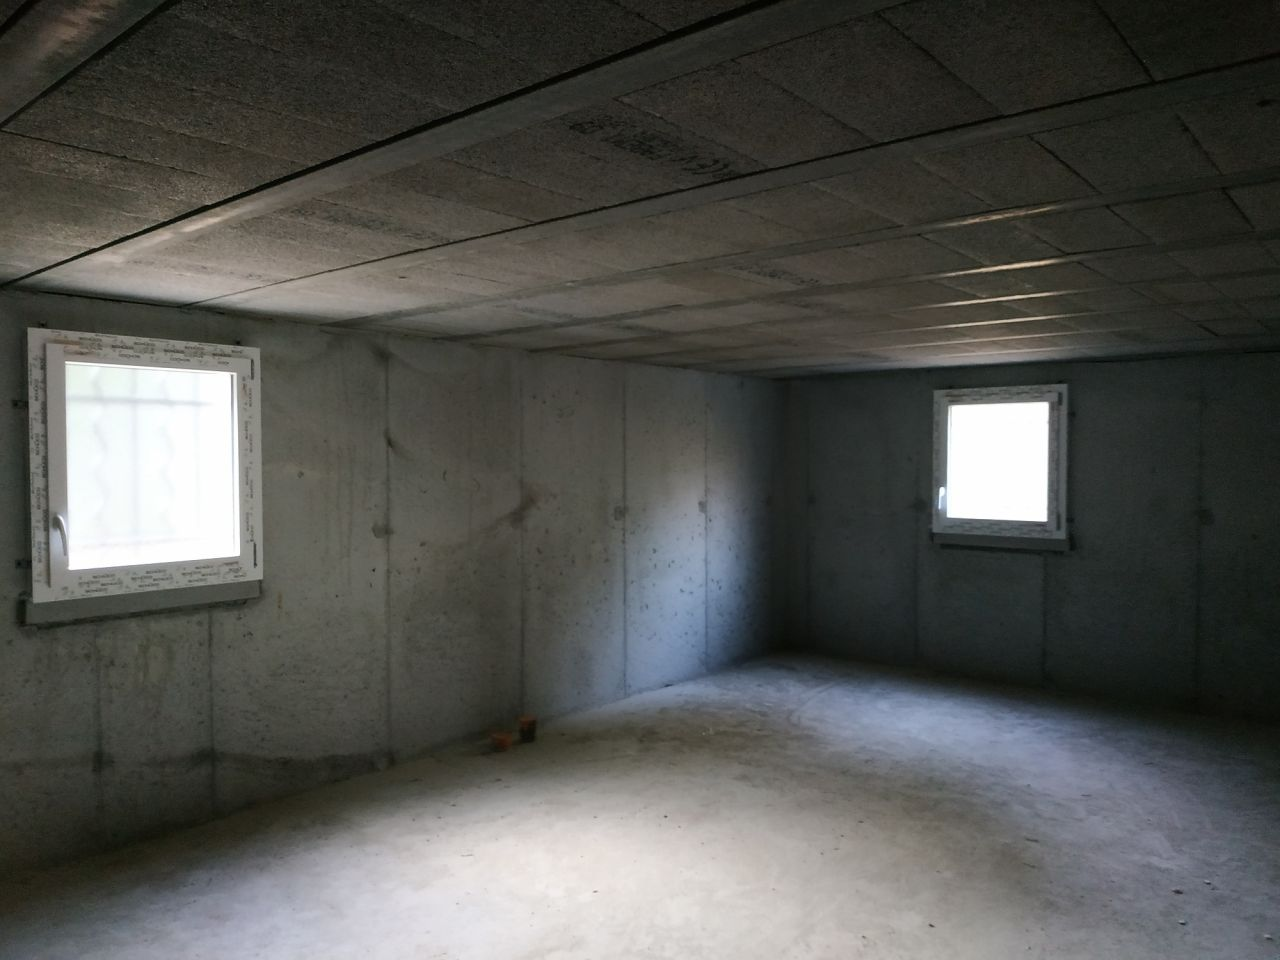 Fenêtres du garage ( oscillo-battantes ).